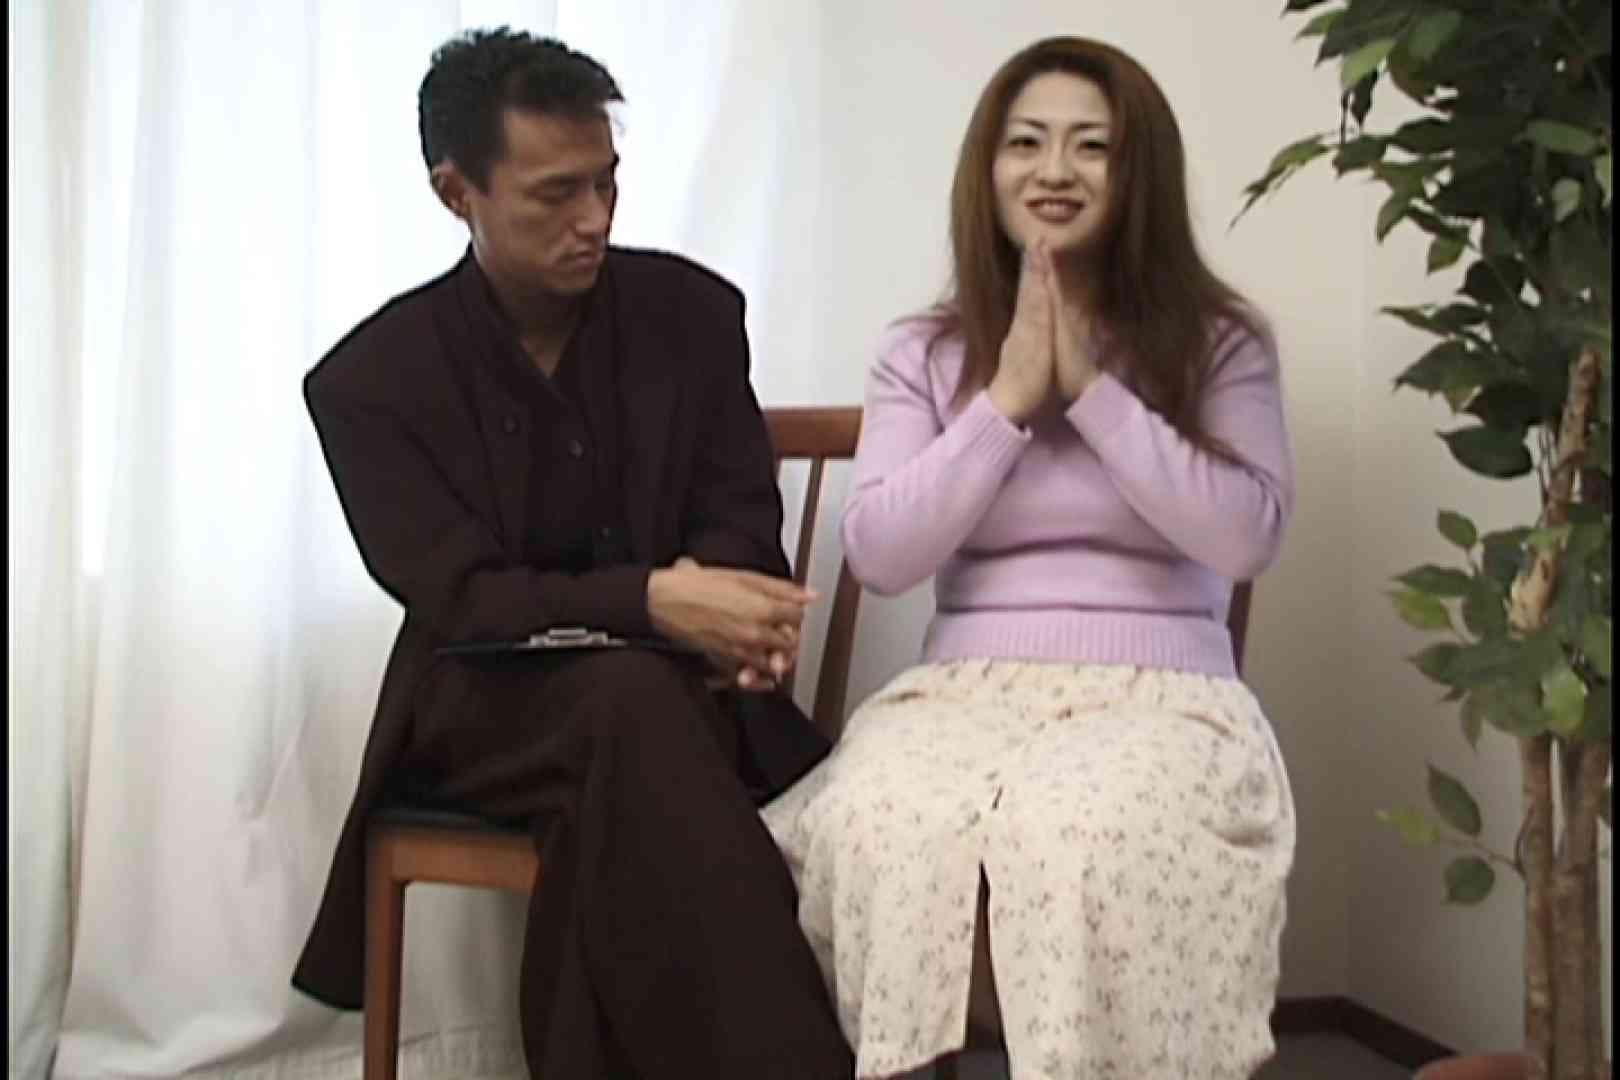 昼間の奥様は欲求不満 ~青井祐子~ 熟女  43連発 17